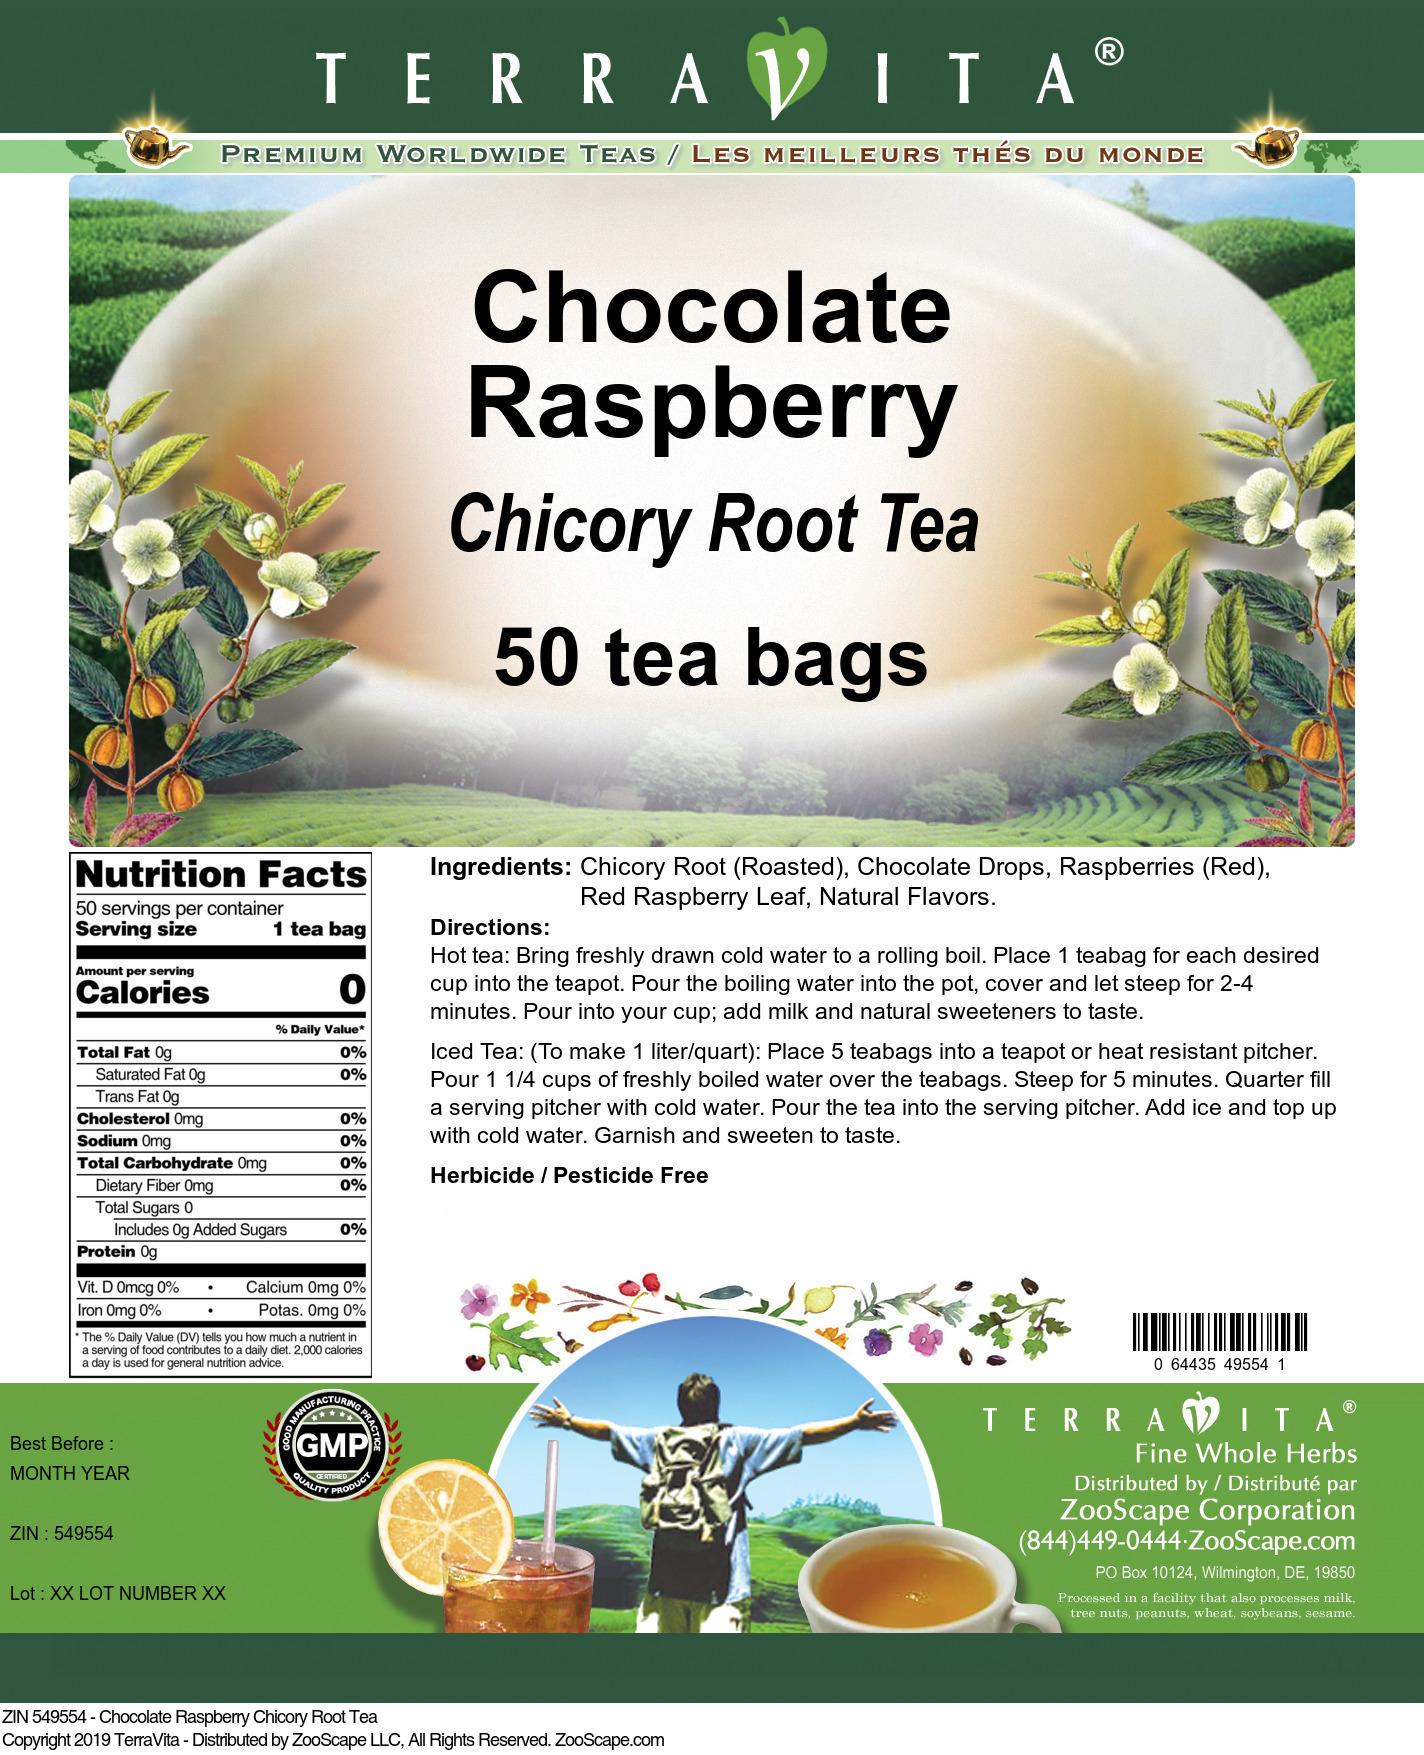 Chocolate Raspberry Chicory Root Tea